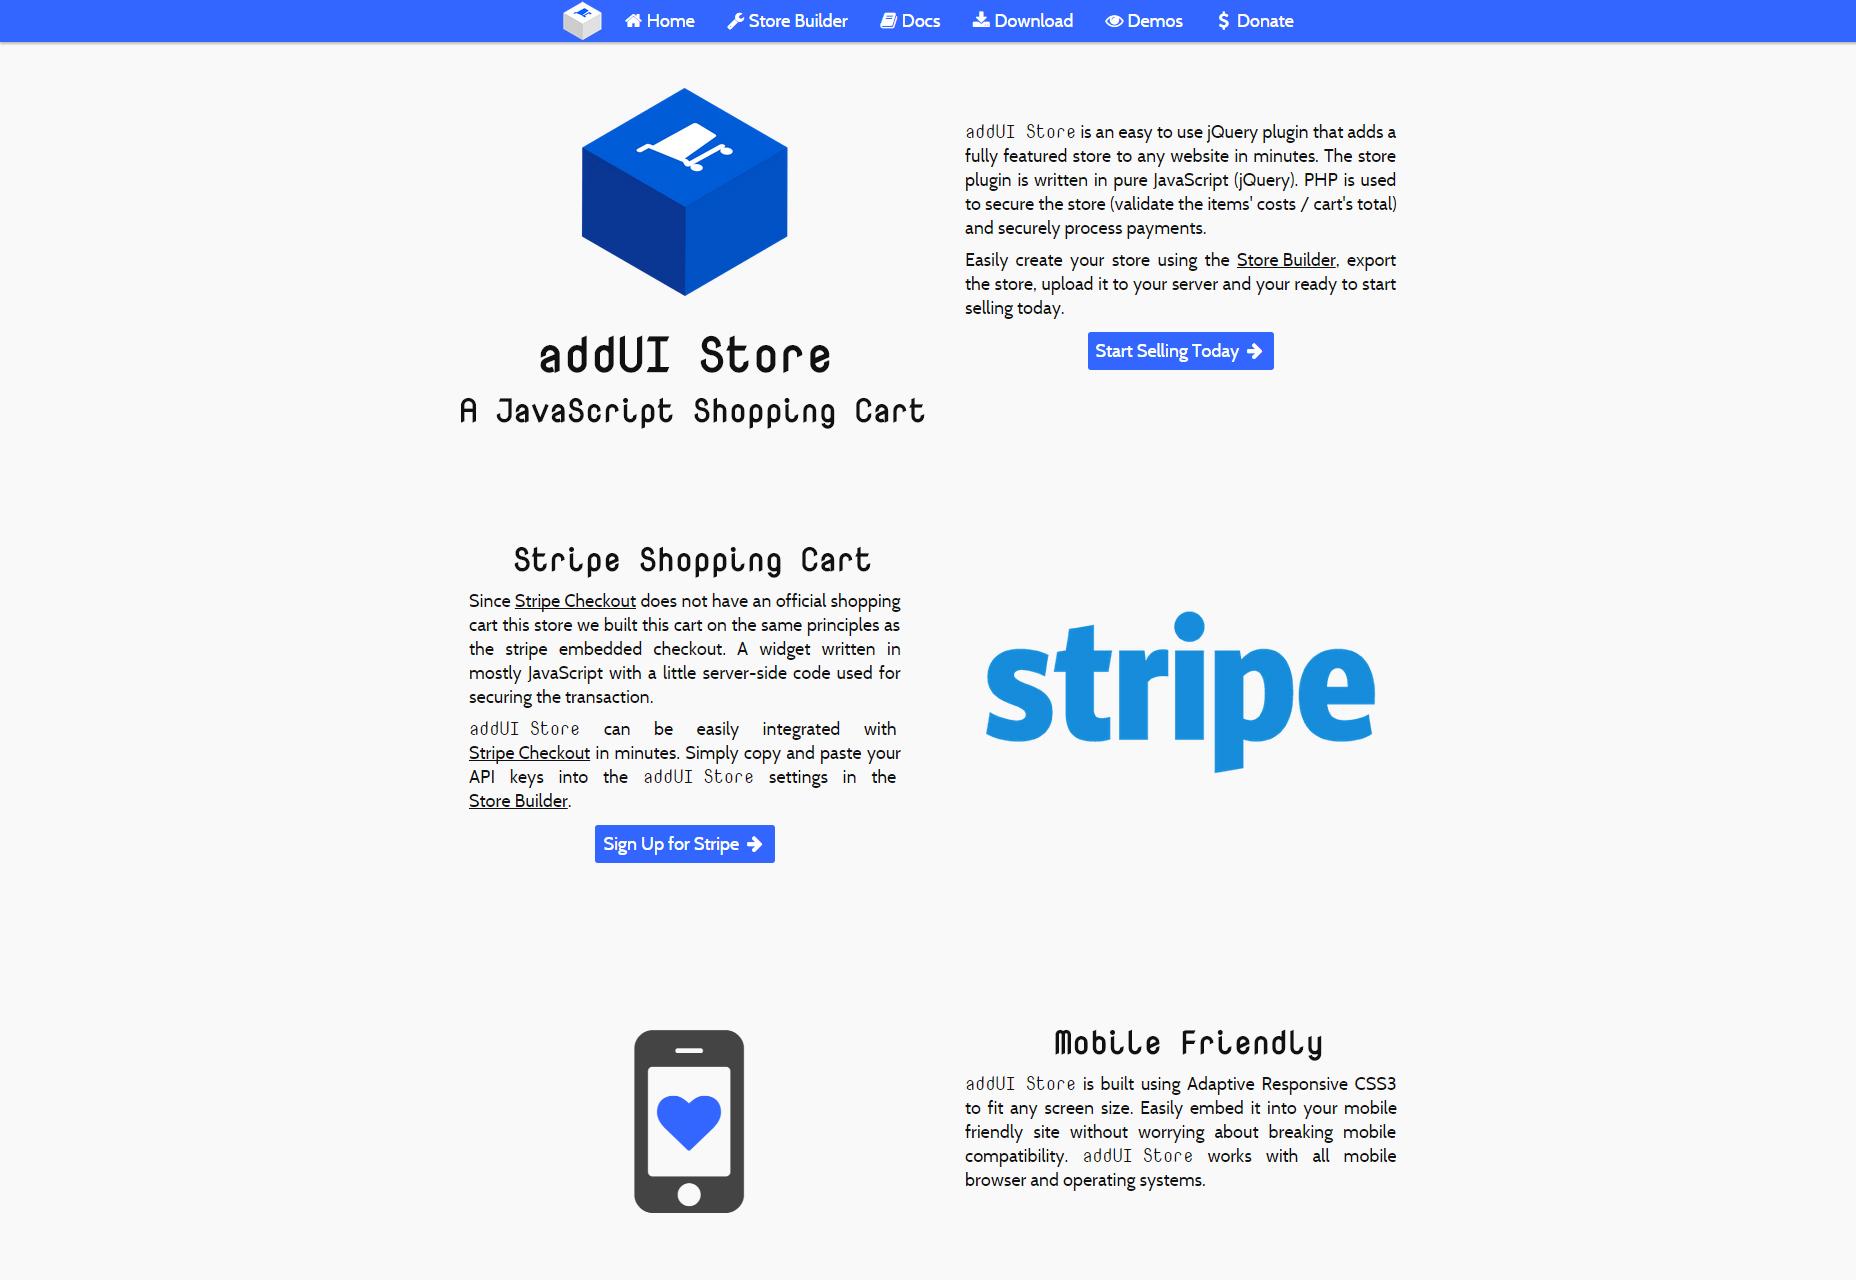 AddUI Store: A JavaScript Shopping Cart